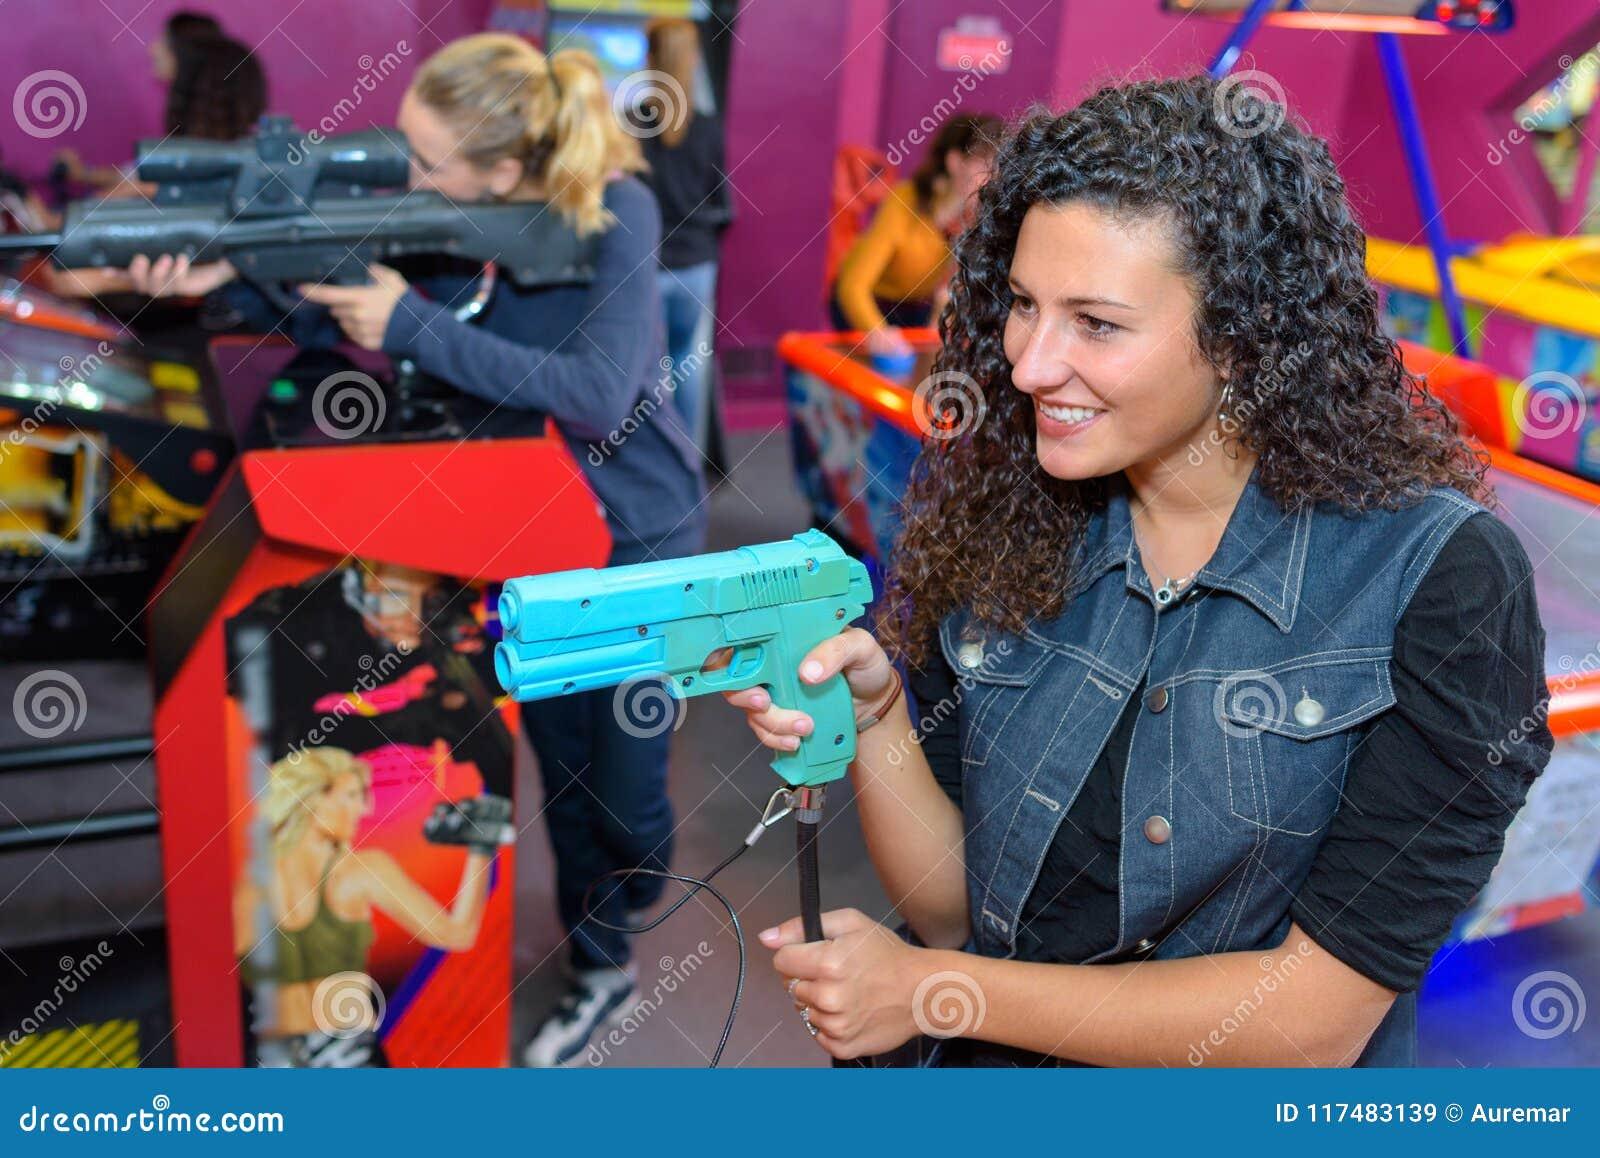 Playing at the arcade